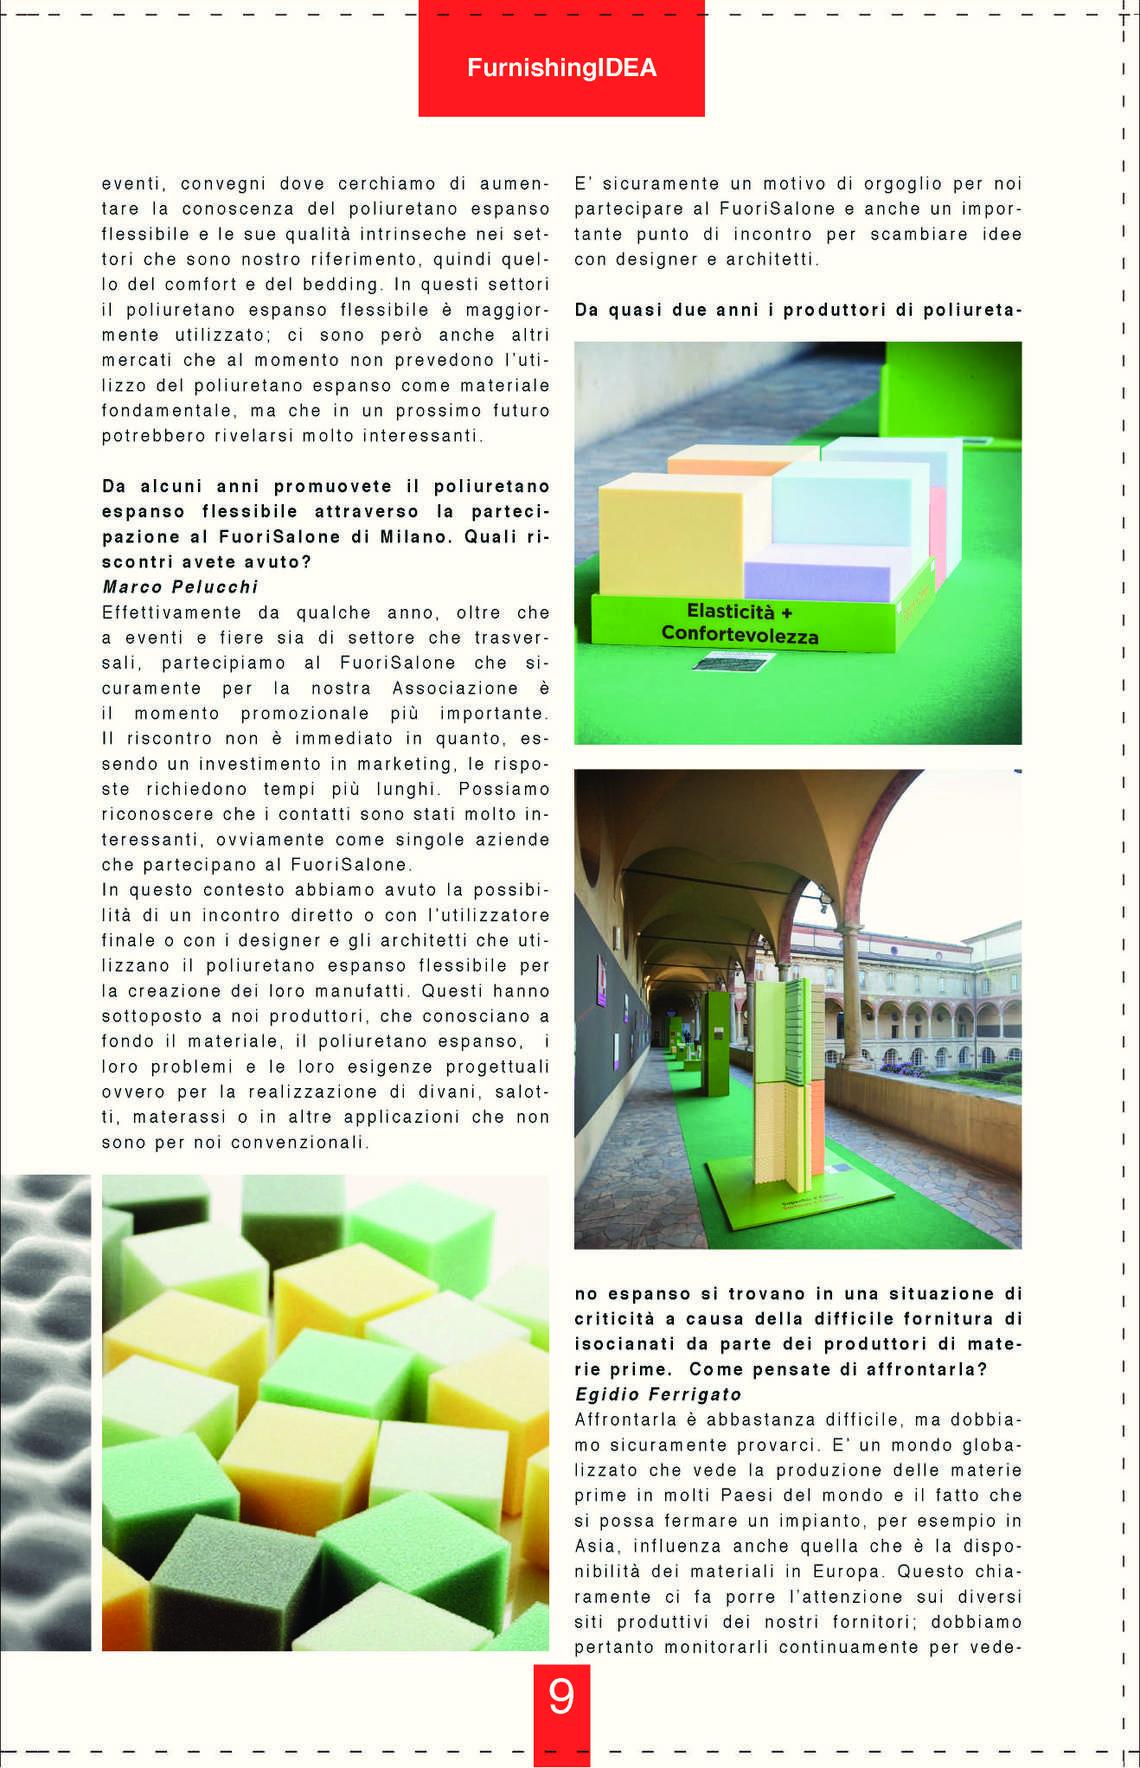 furnishing-idea-journal--1-2018_journal_9_008.jpg